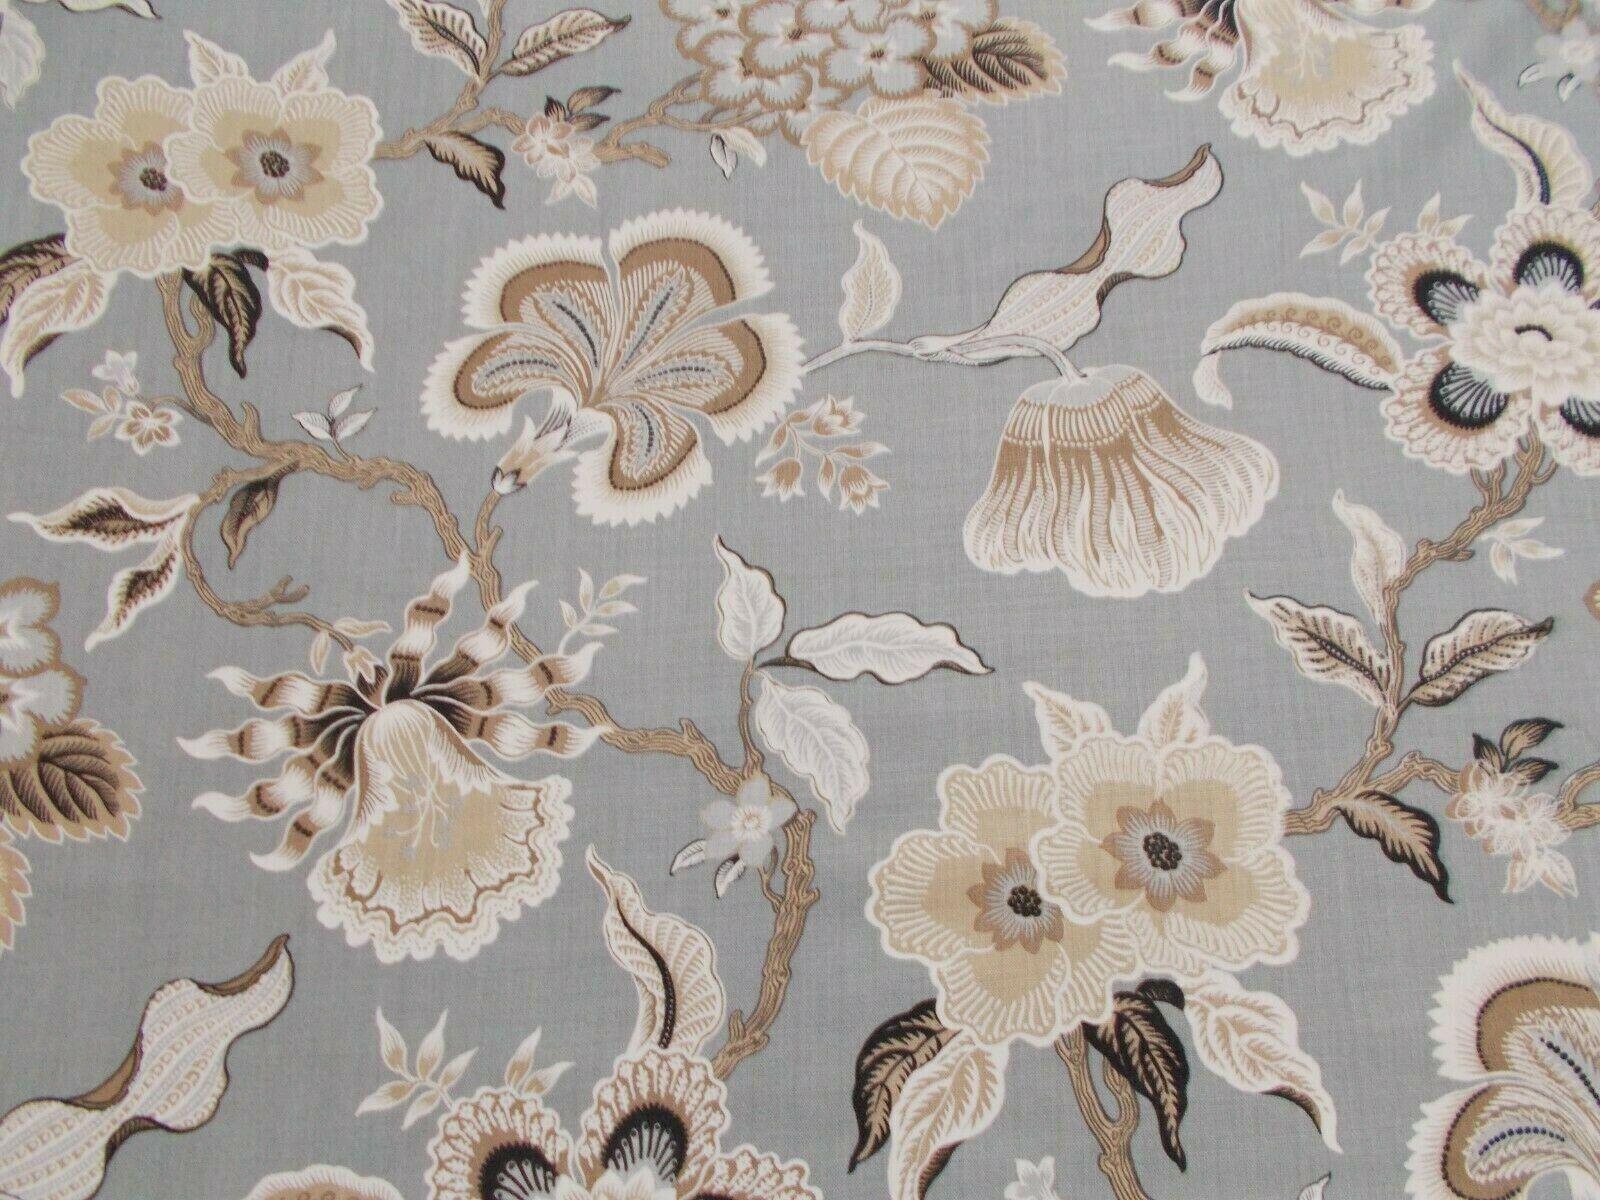 Schumacher Curtain Fabric 'HOTHOUSE FLOWERS' 3 METRES (300cm) MINERAL 100% Linen